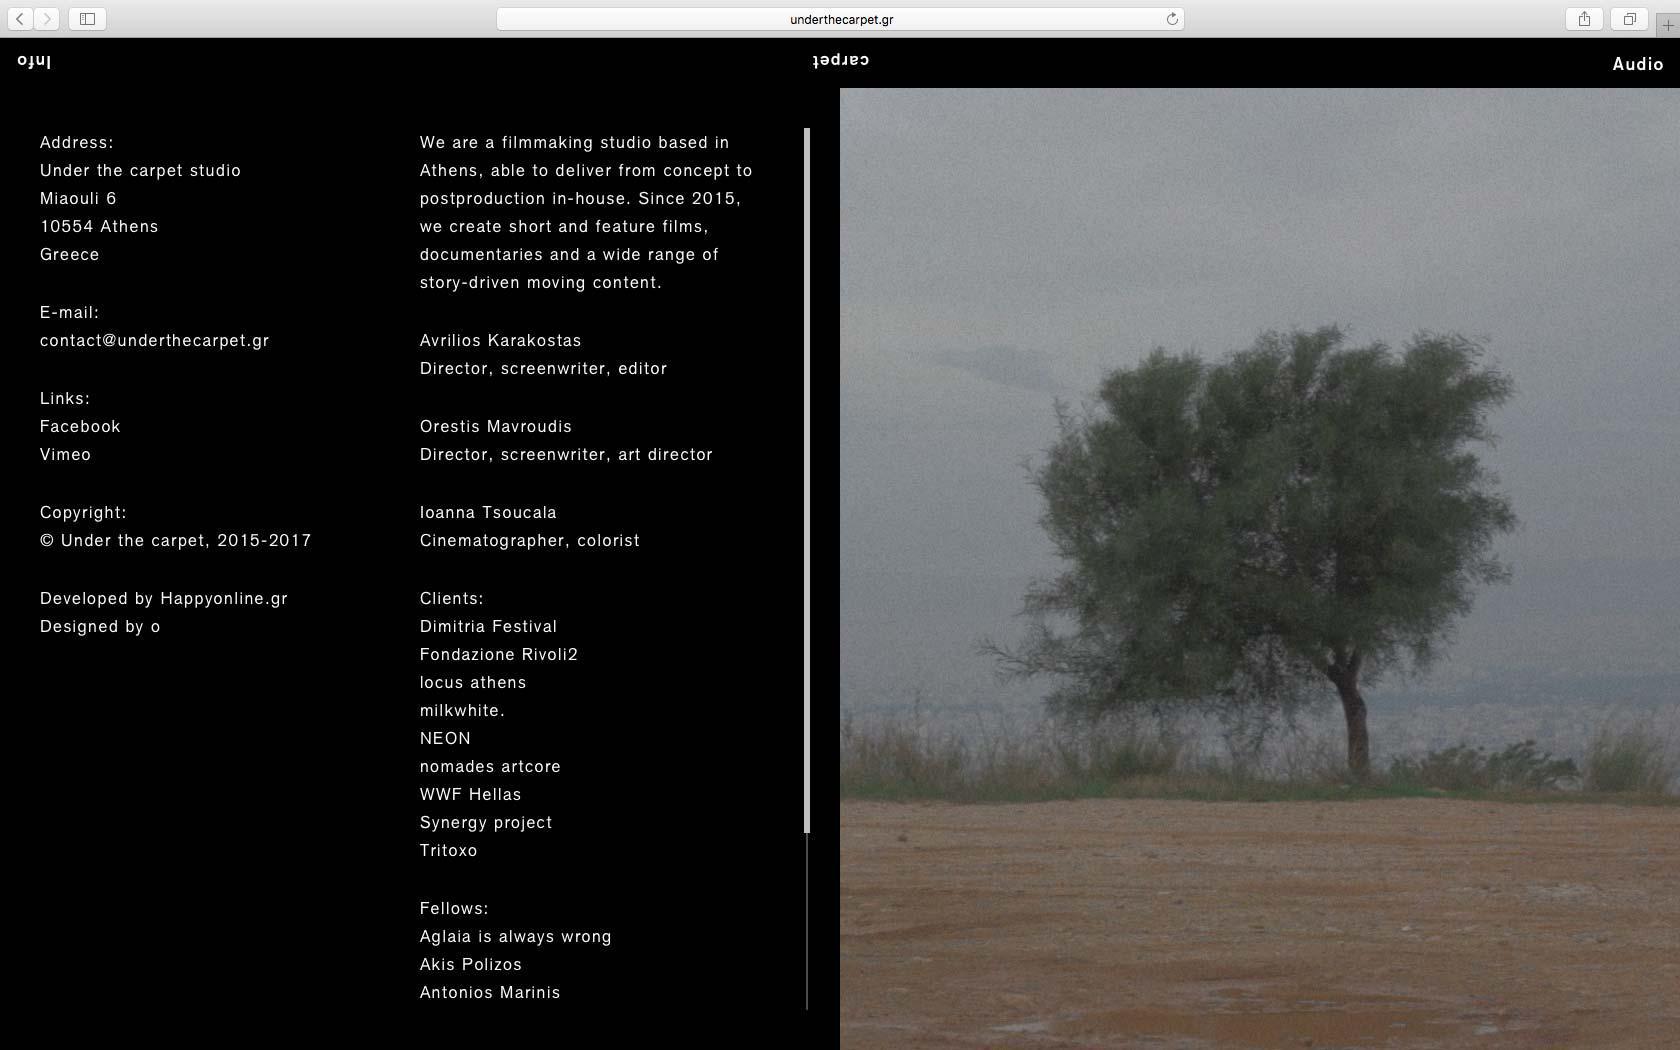 • Under the carpet – Visual identity + Website 4